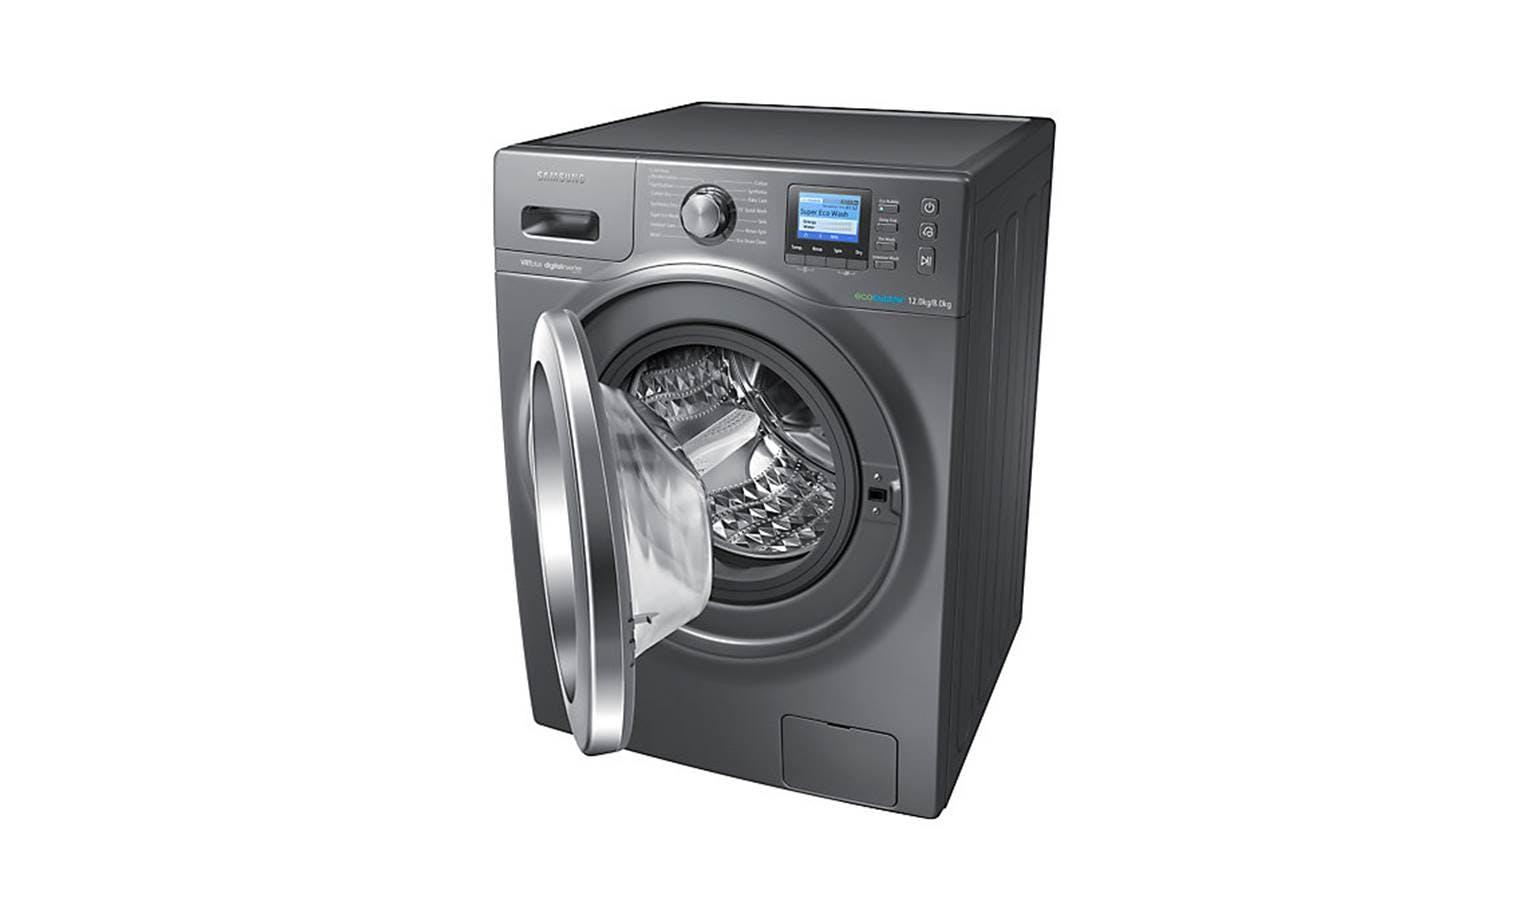 Samsung WD-12F9C9U4X 12/8KG Washer and Dryer